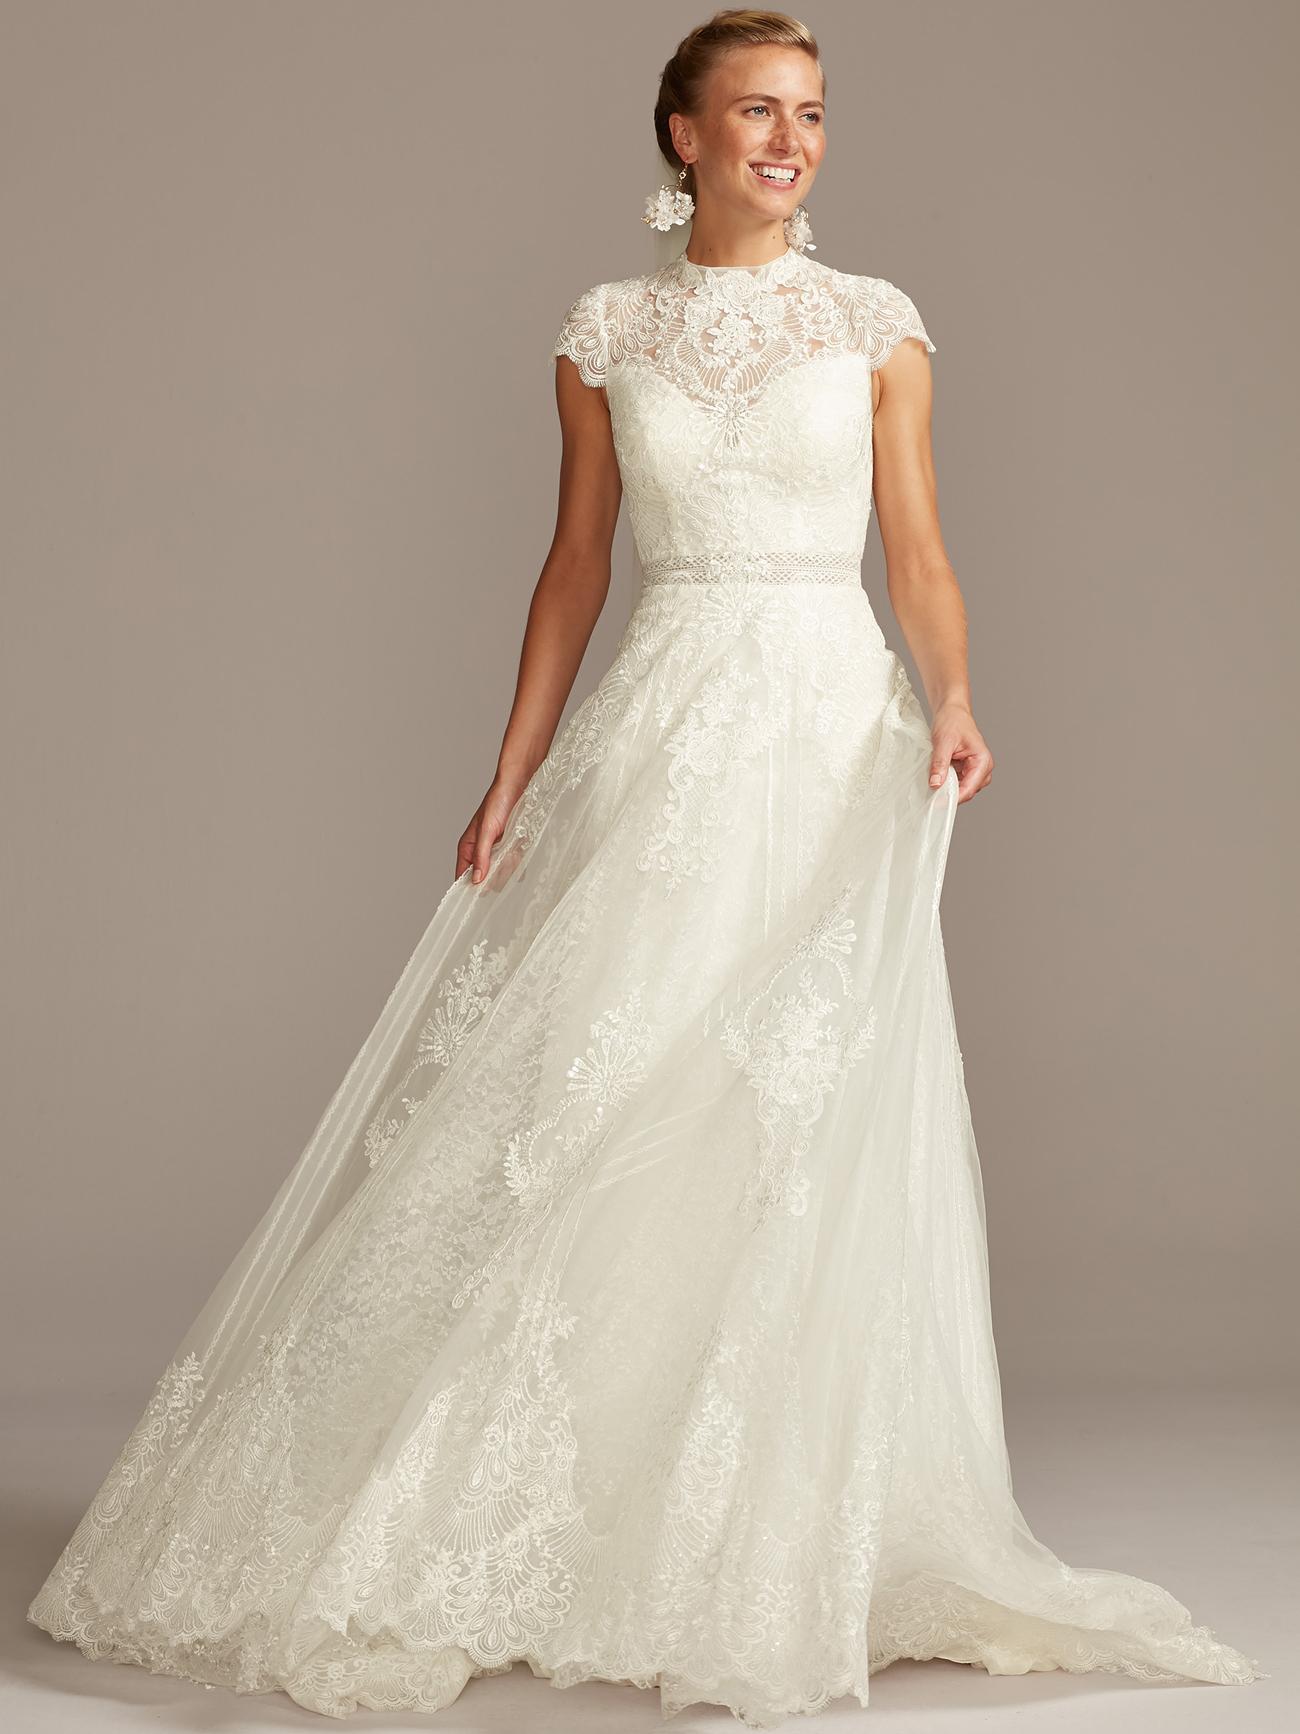 davids bridal melissa sweet high neck cap sleeve lace wedding dress fall 2020